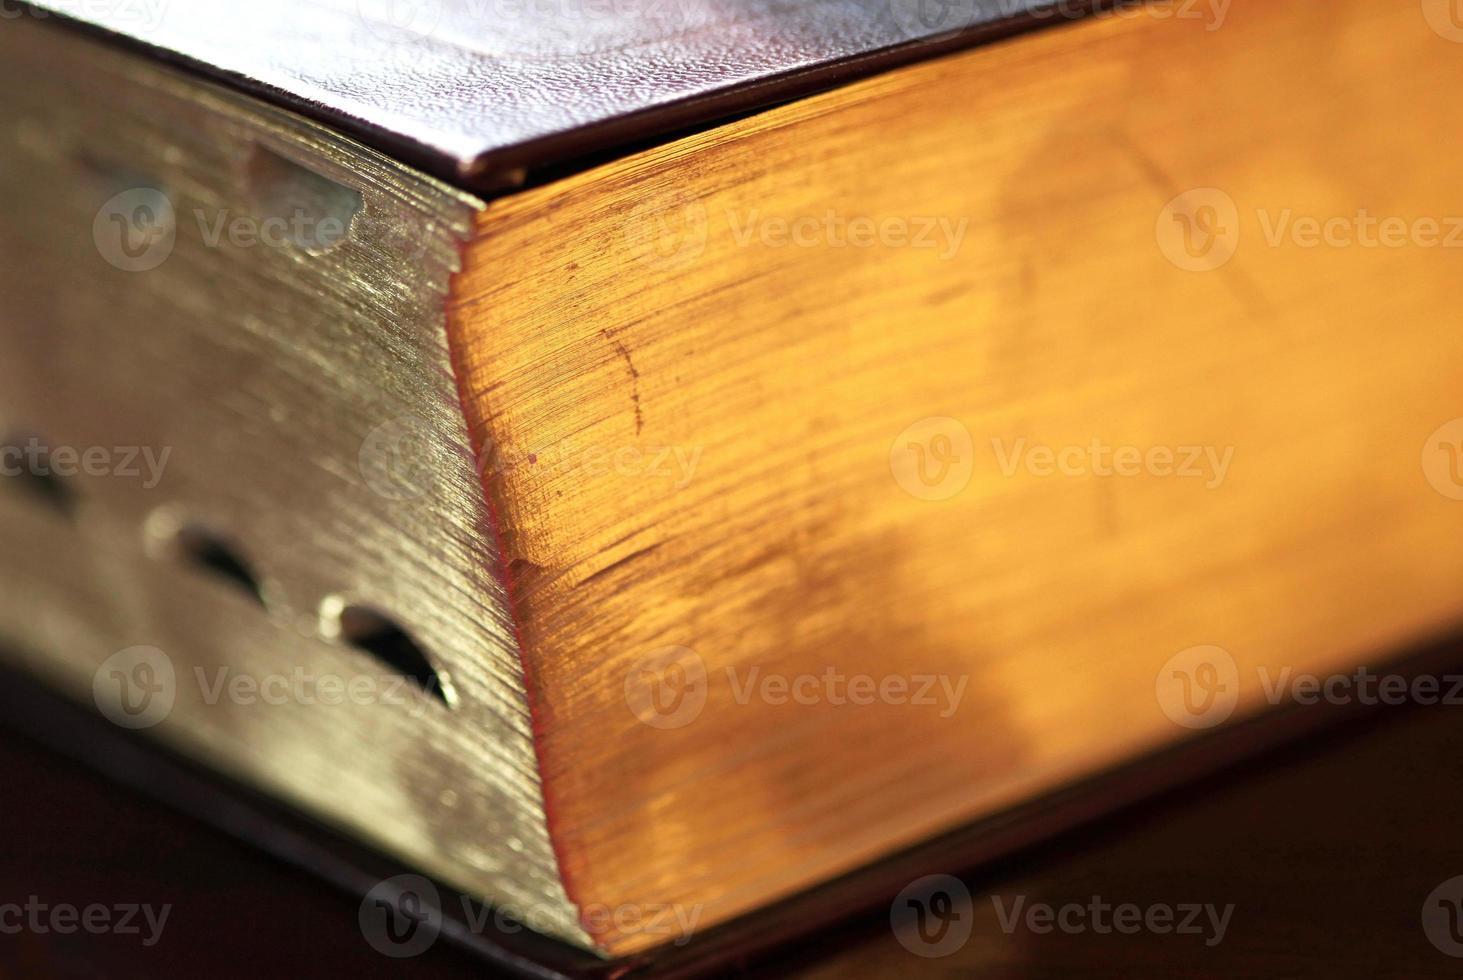 Bíblia de perto foto